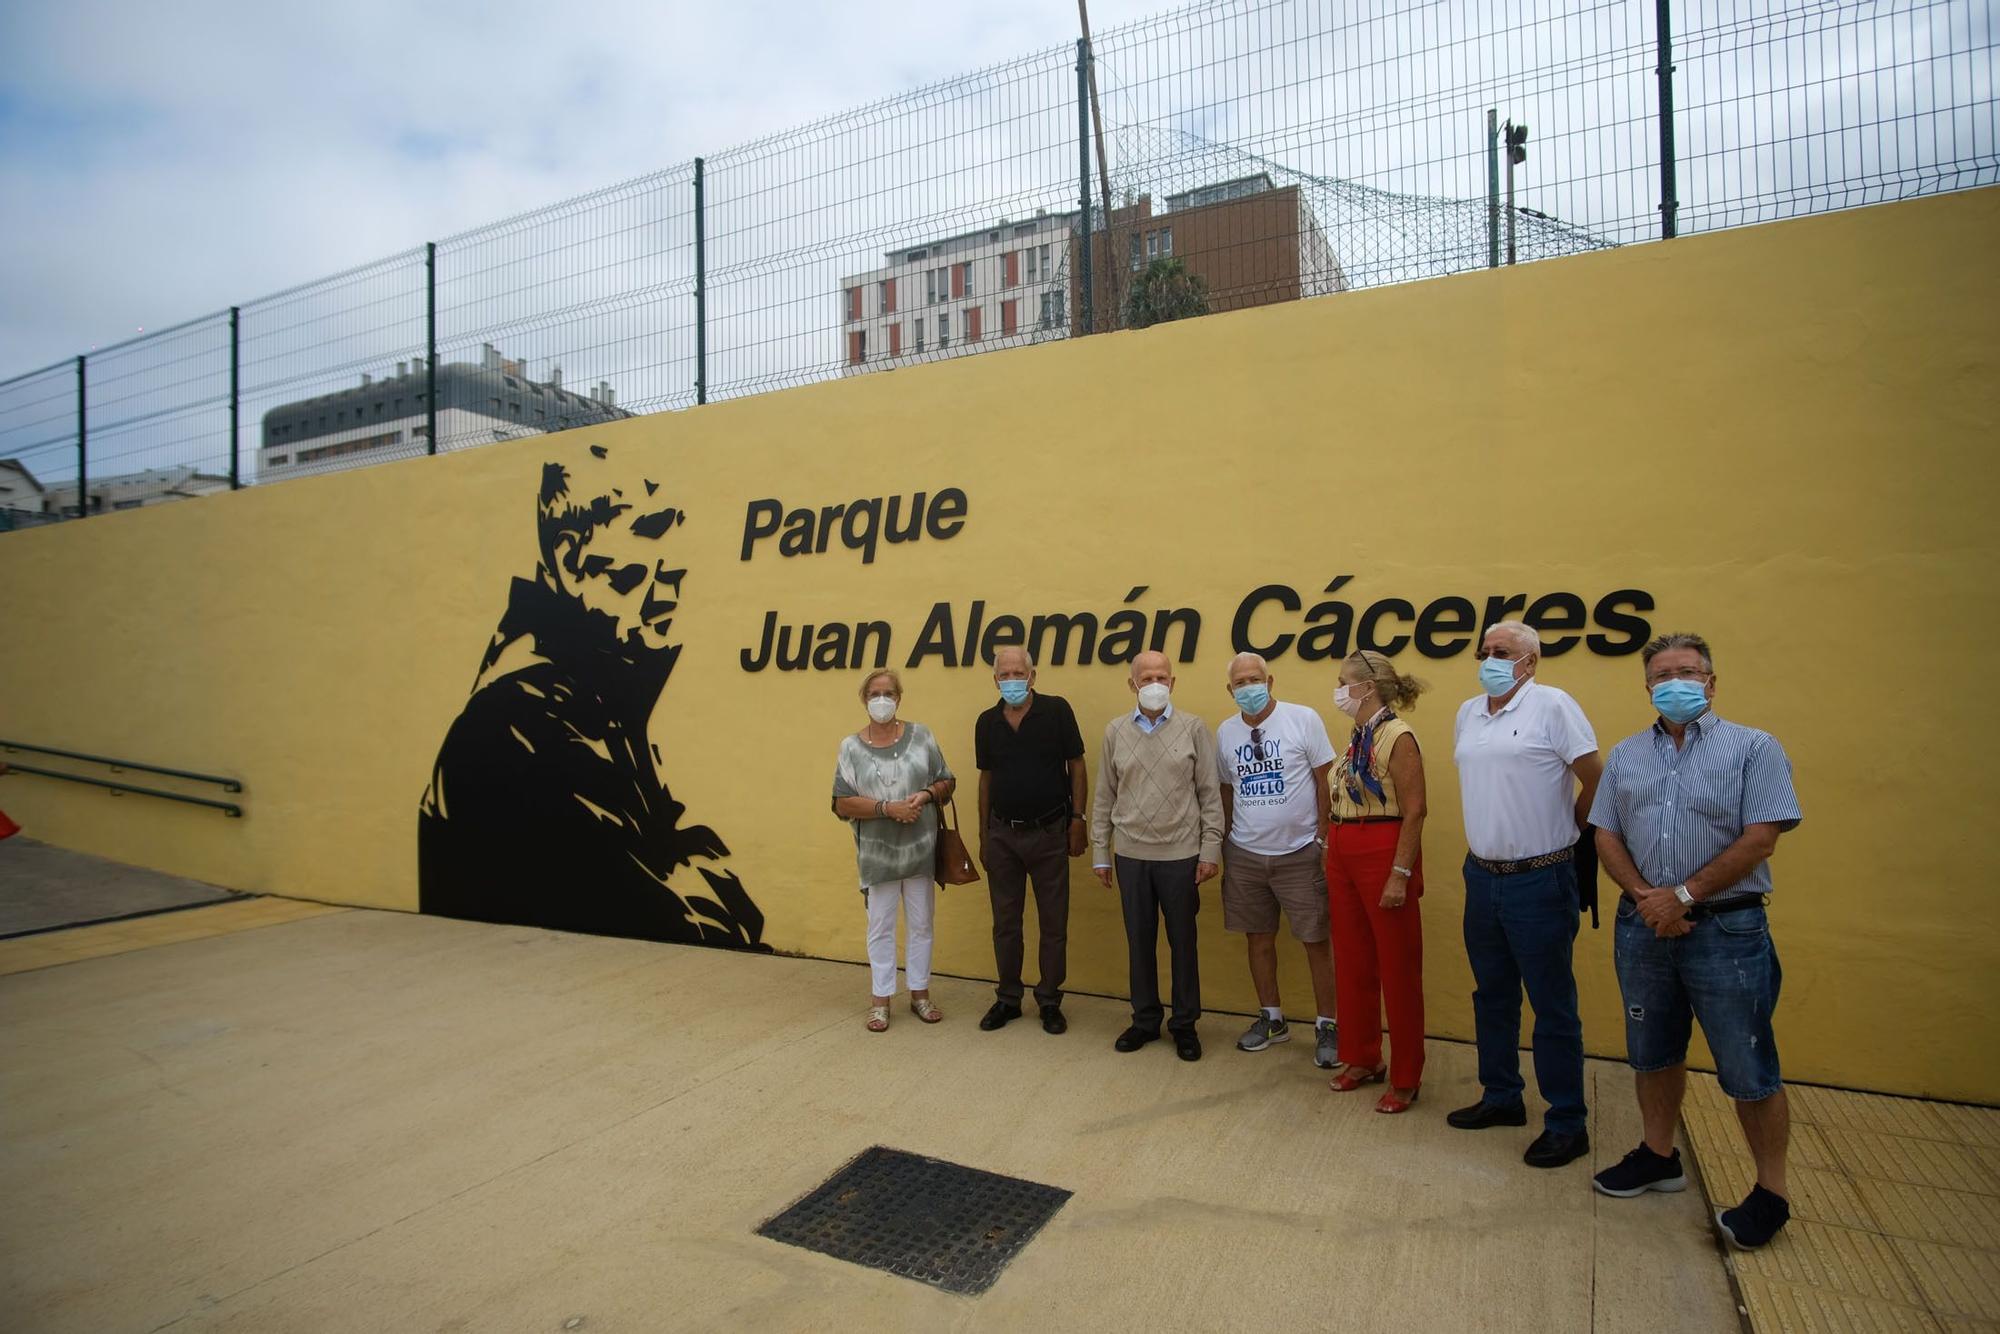 Homenaje a Juan Alemán Cáceres, histórico líder vecinal de La Paterna